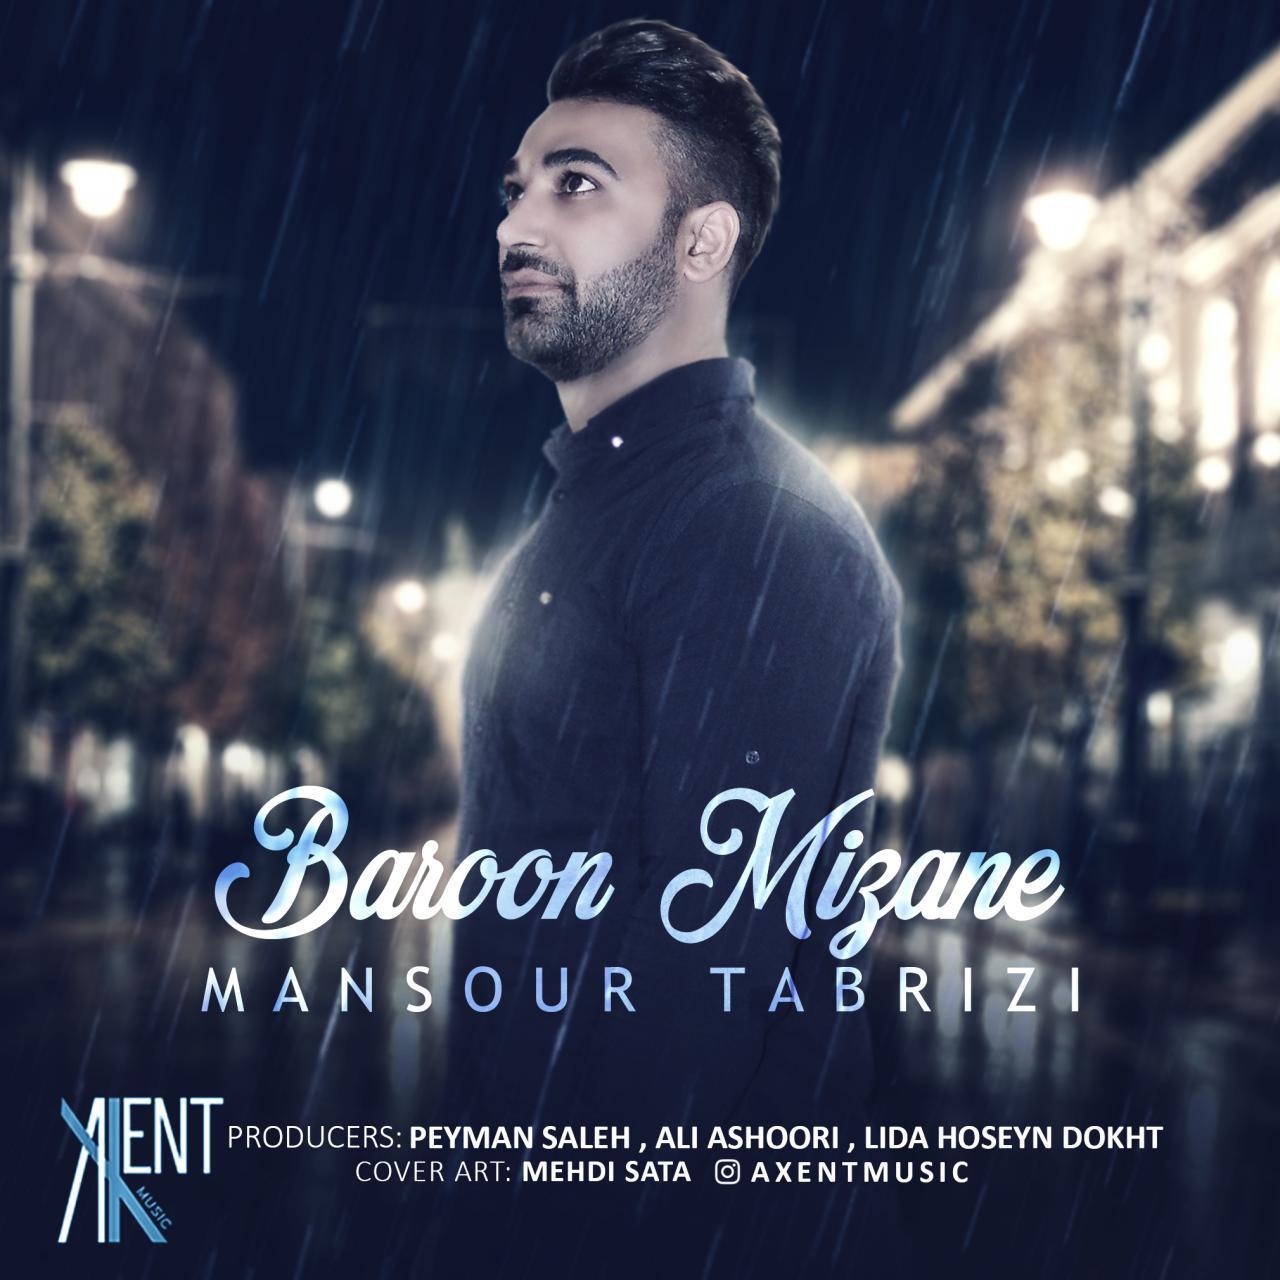 Mansour Tabrizi – Baroon Mizane